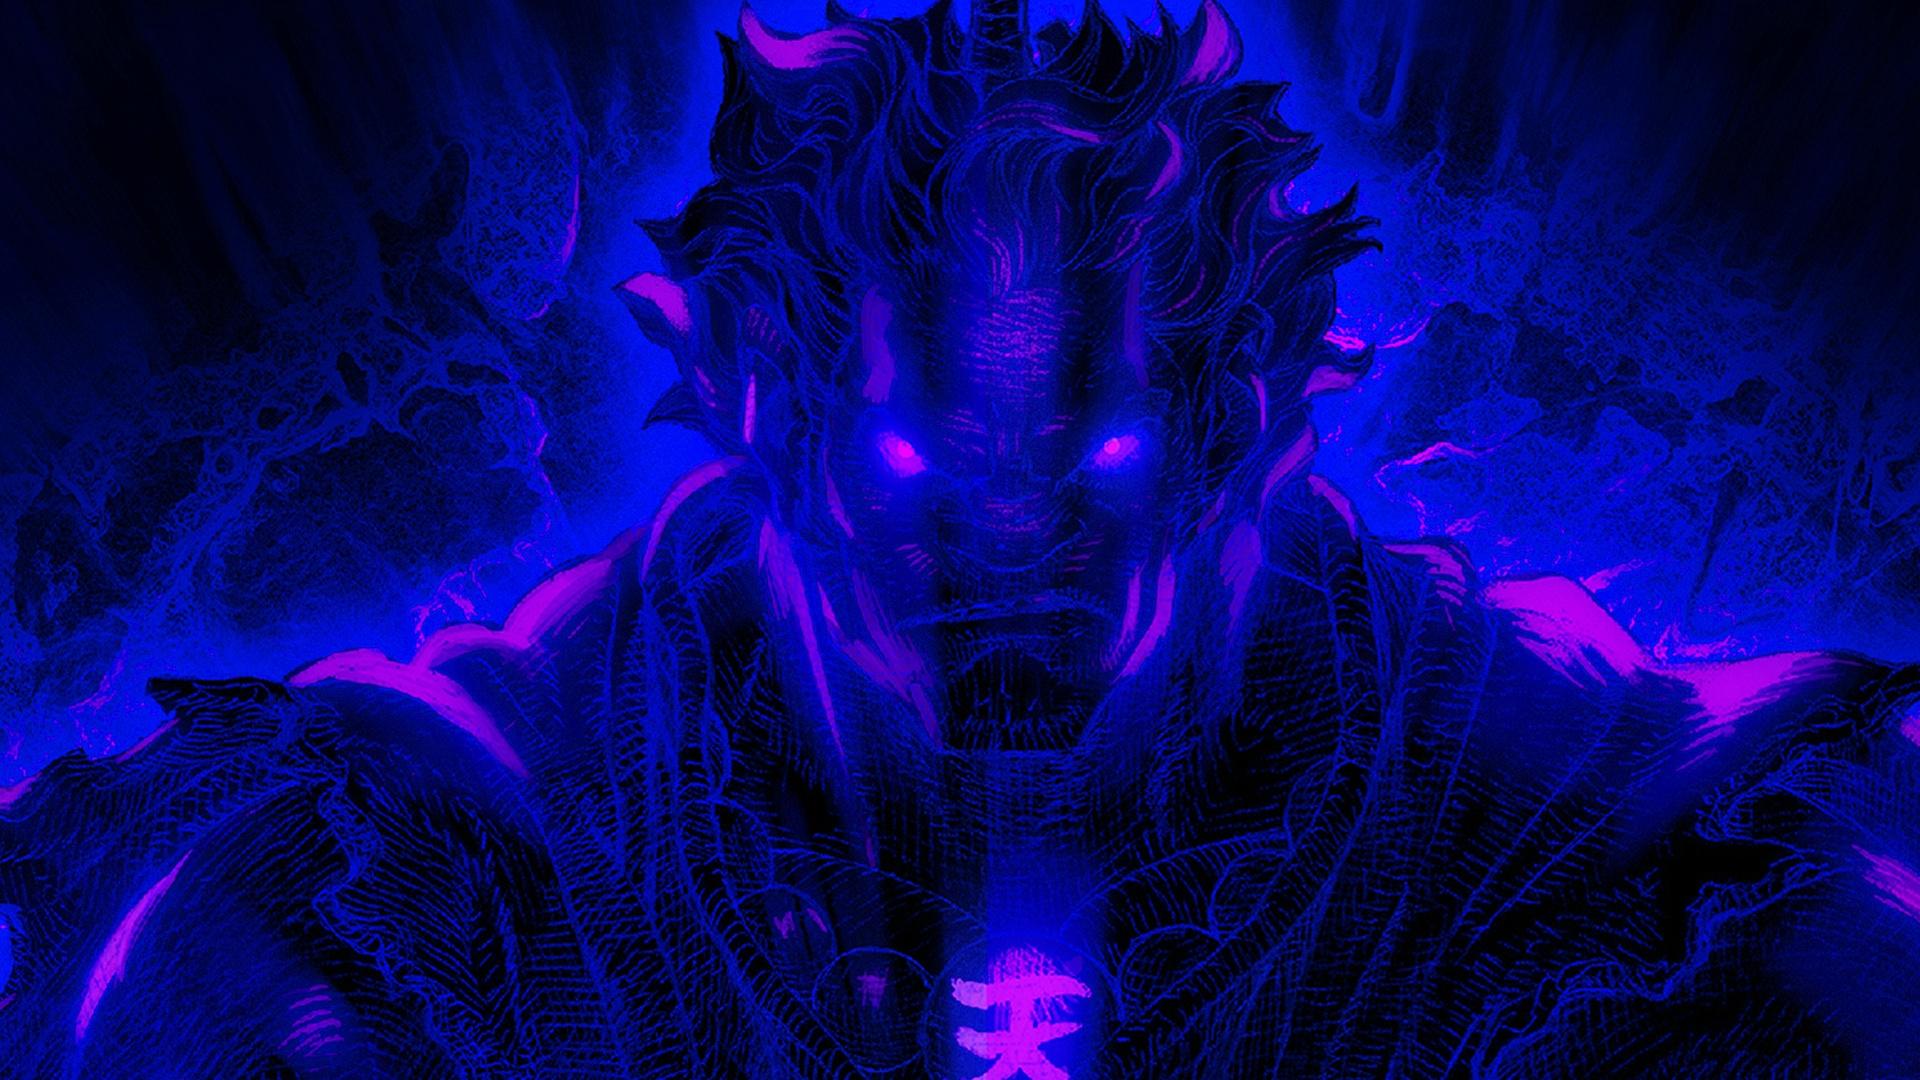 You Can Unlock Shin Akuma In Ultra Street Fighter Ii The Final